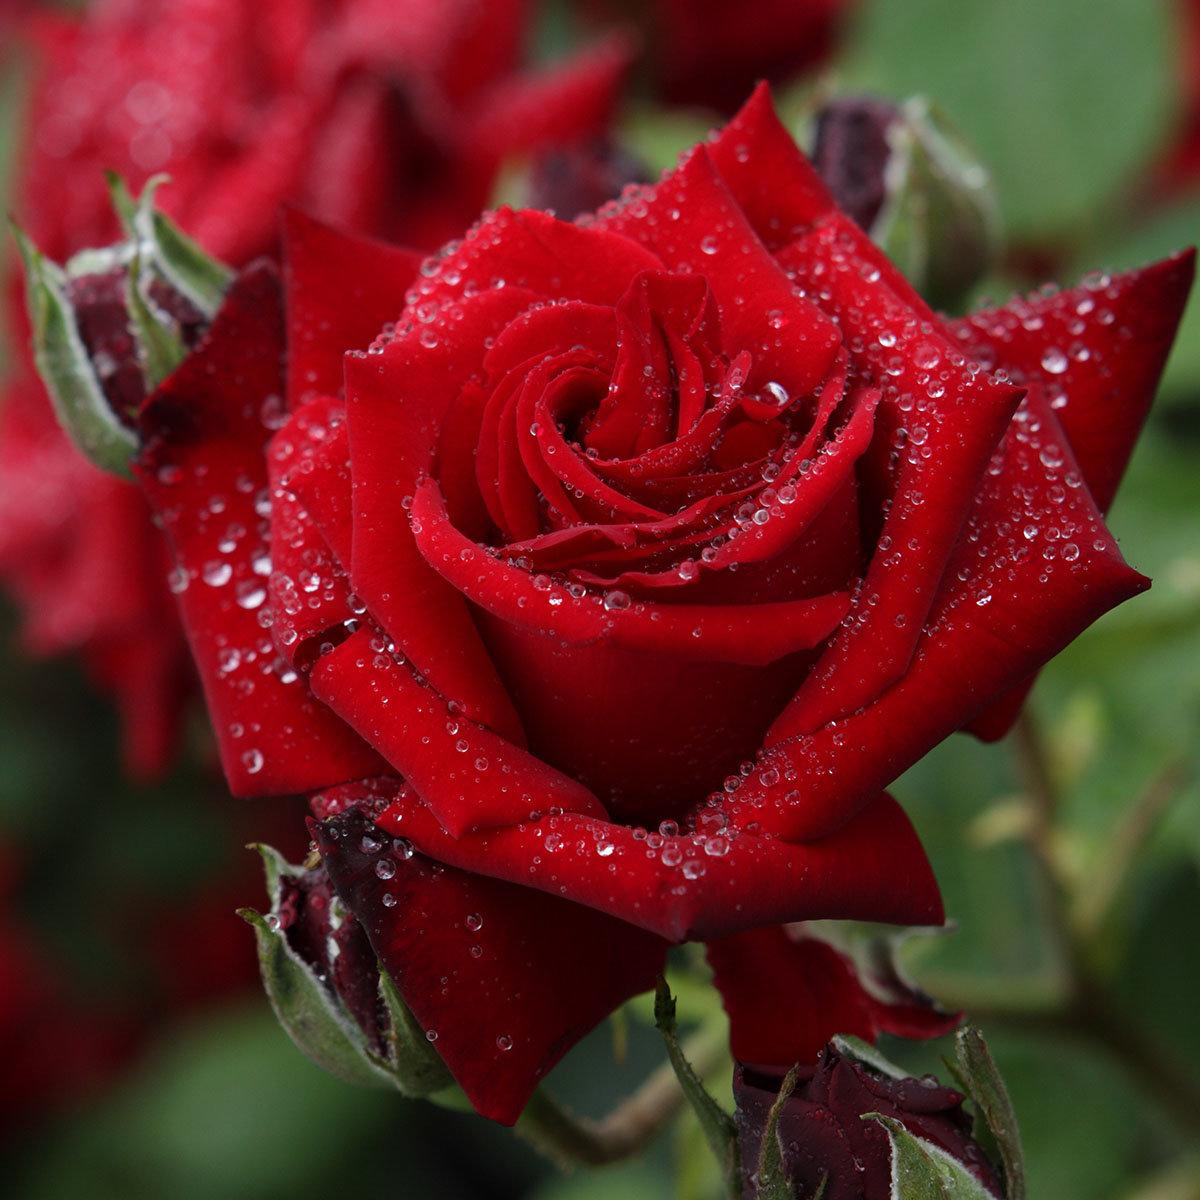 rose ingrid bergmann im 5 liter topf online kaufen bei g rtner p tschke. Black Bedroom Furniture Sets. Home Design Ideas